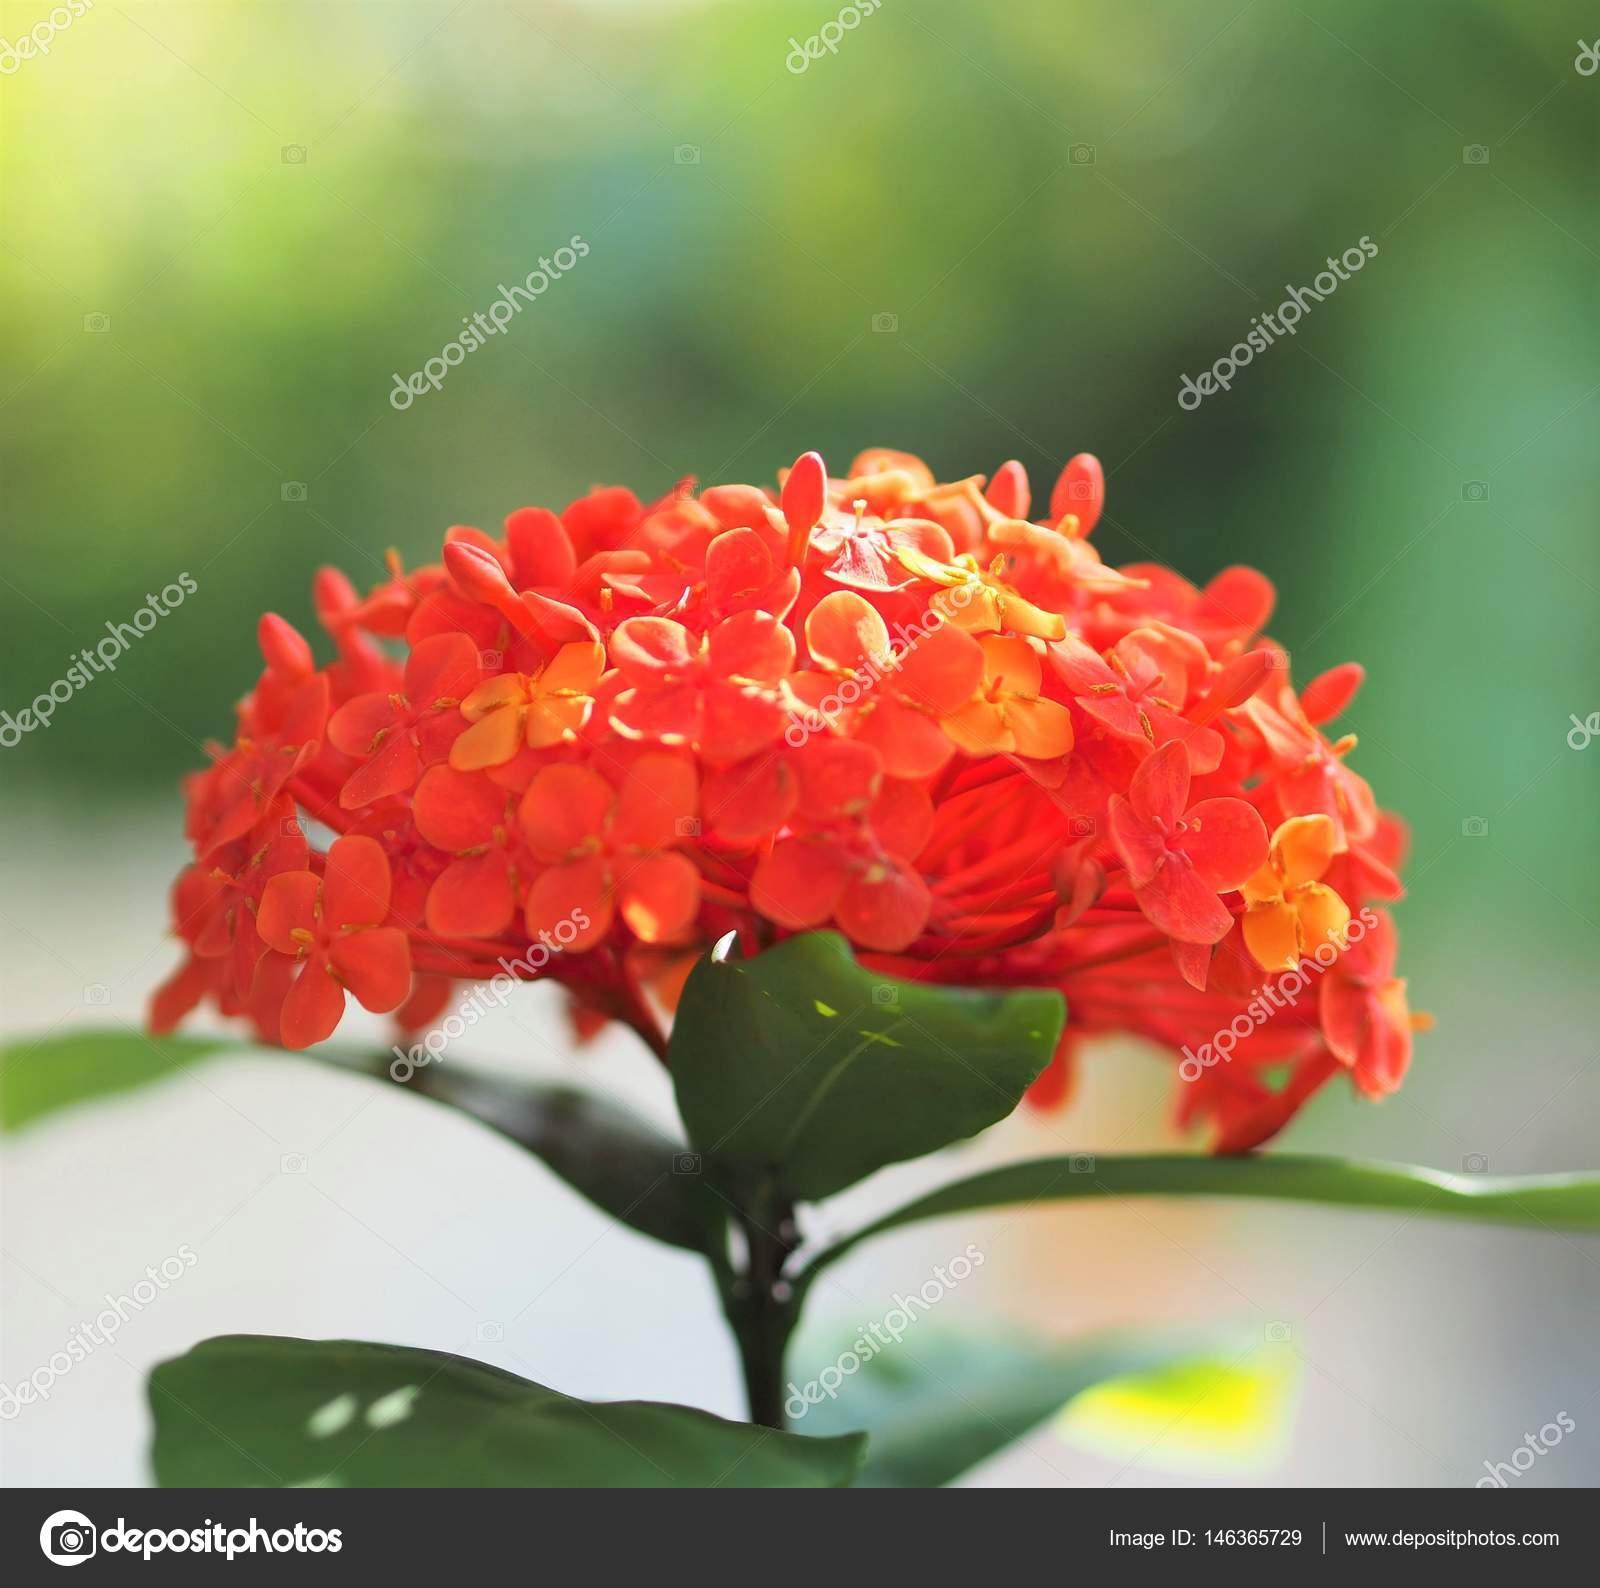 Suficiente Flor de flor vermelha Ixora Coccinea — Stock Photo © WernBkk  FH58